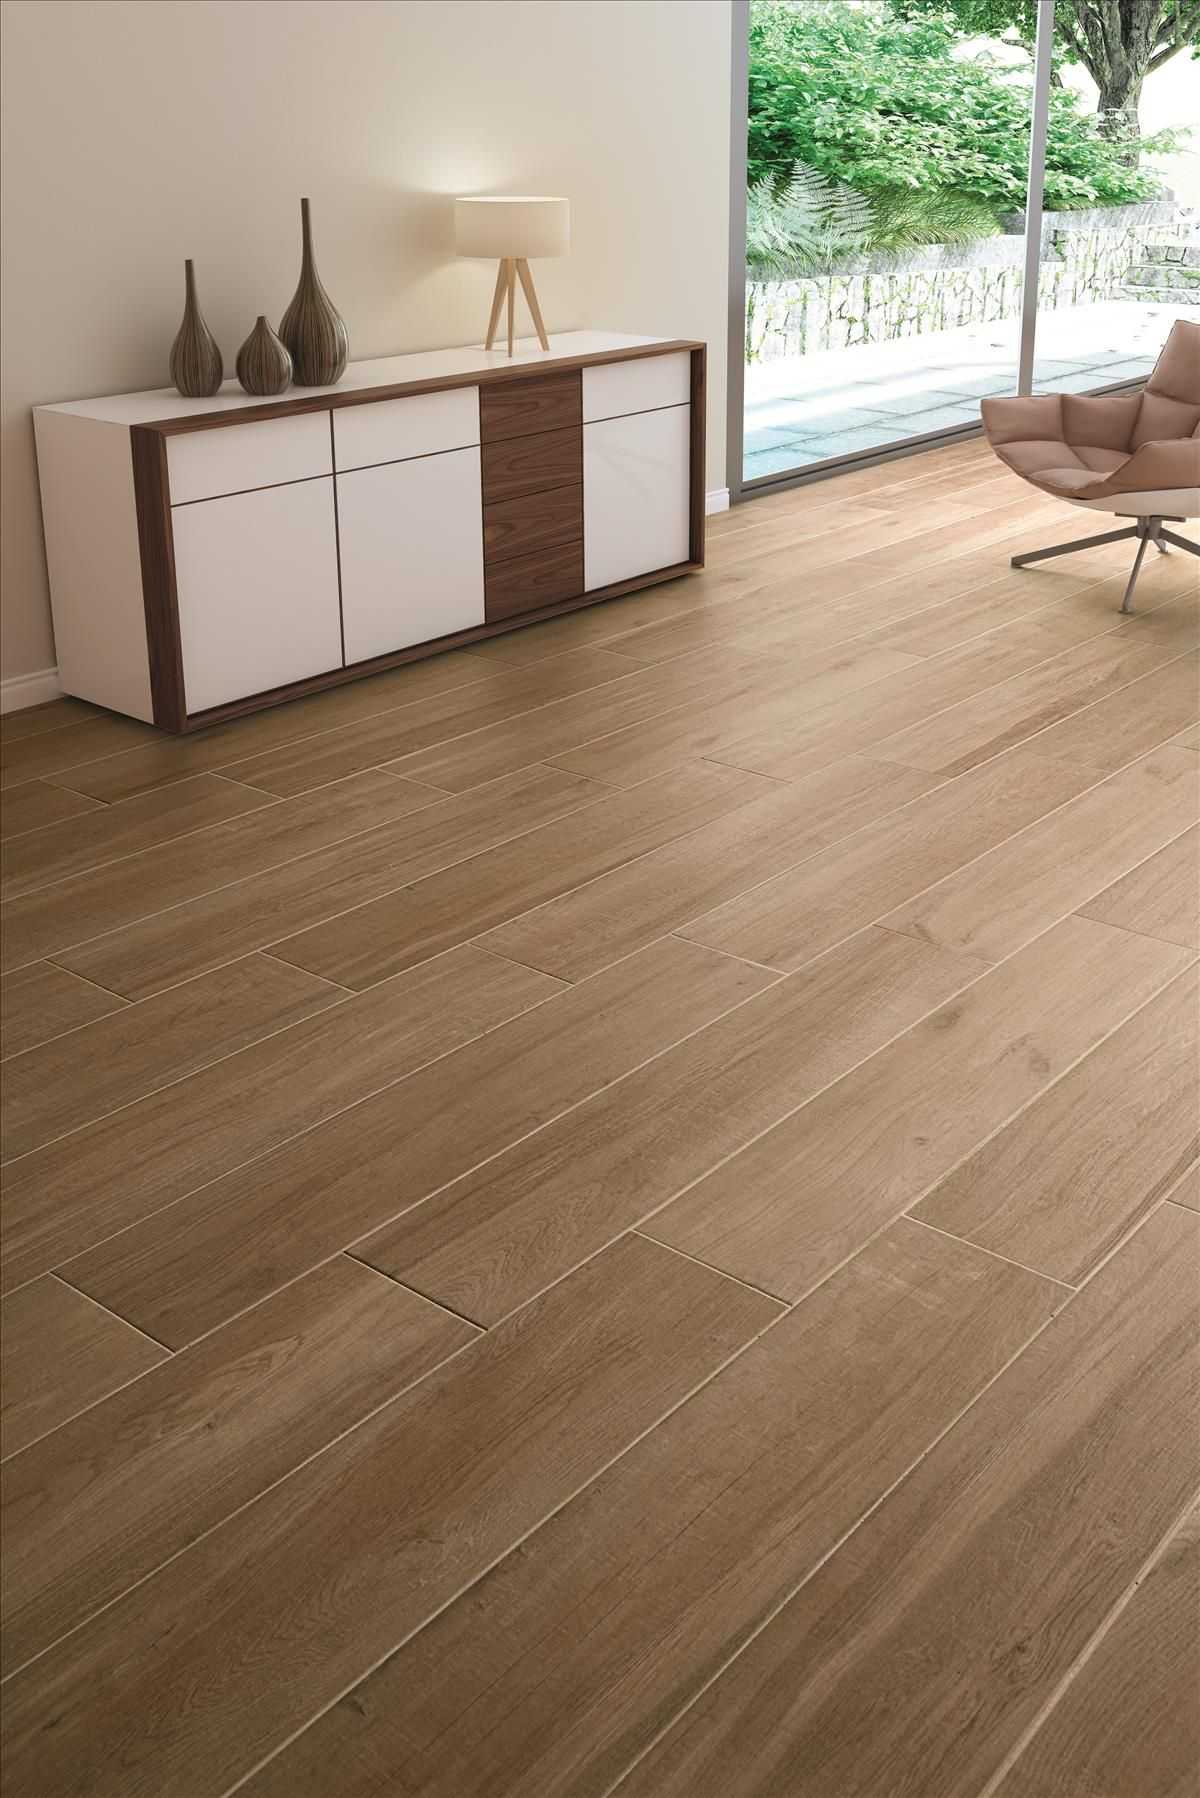 Pavimento imitaci n madera terk natural 1 23x120 for Pavimento imitacion madera